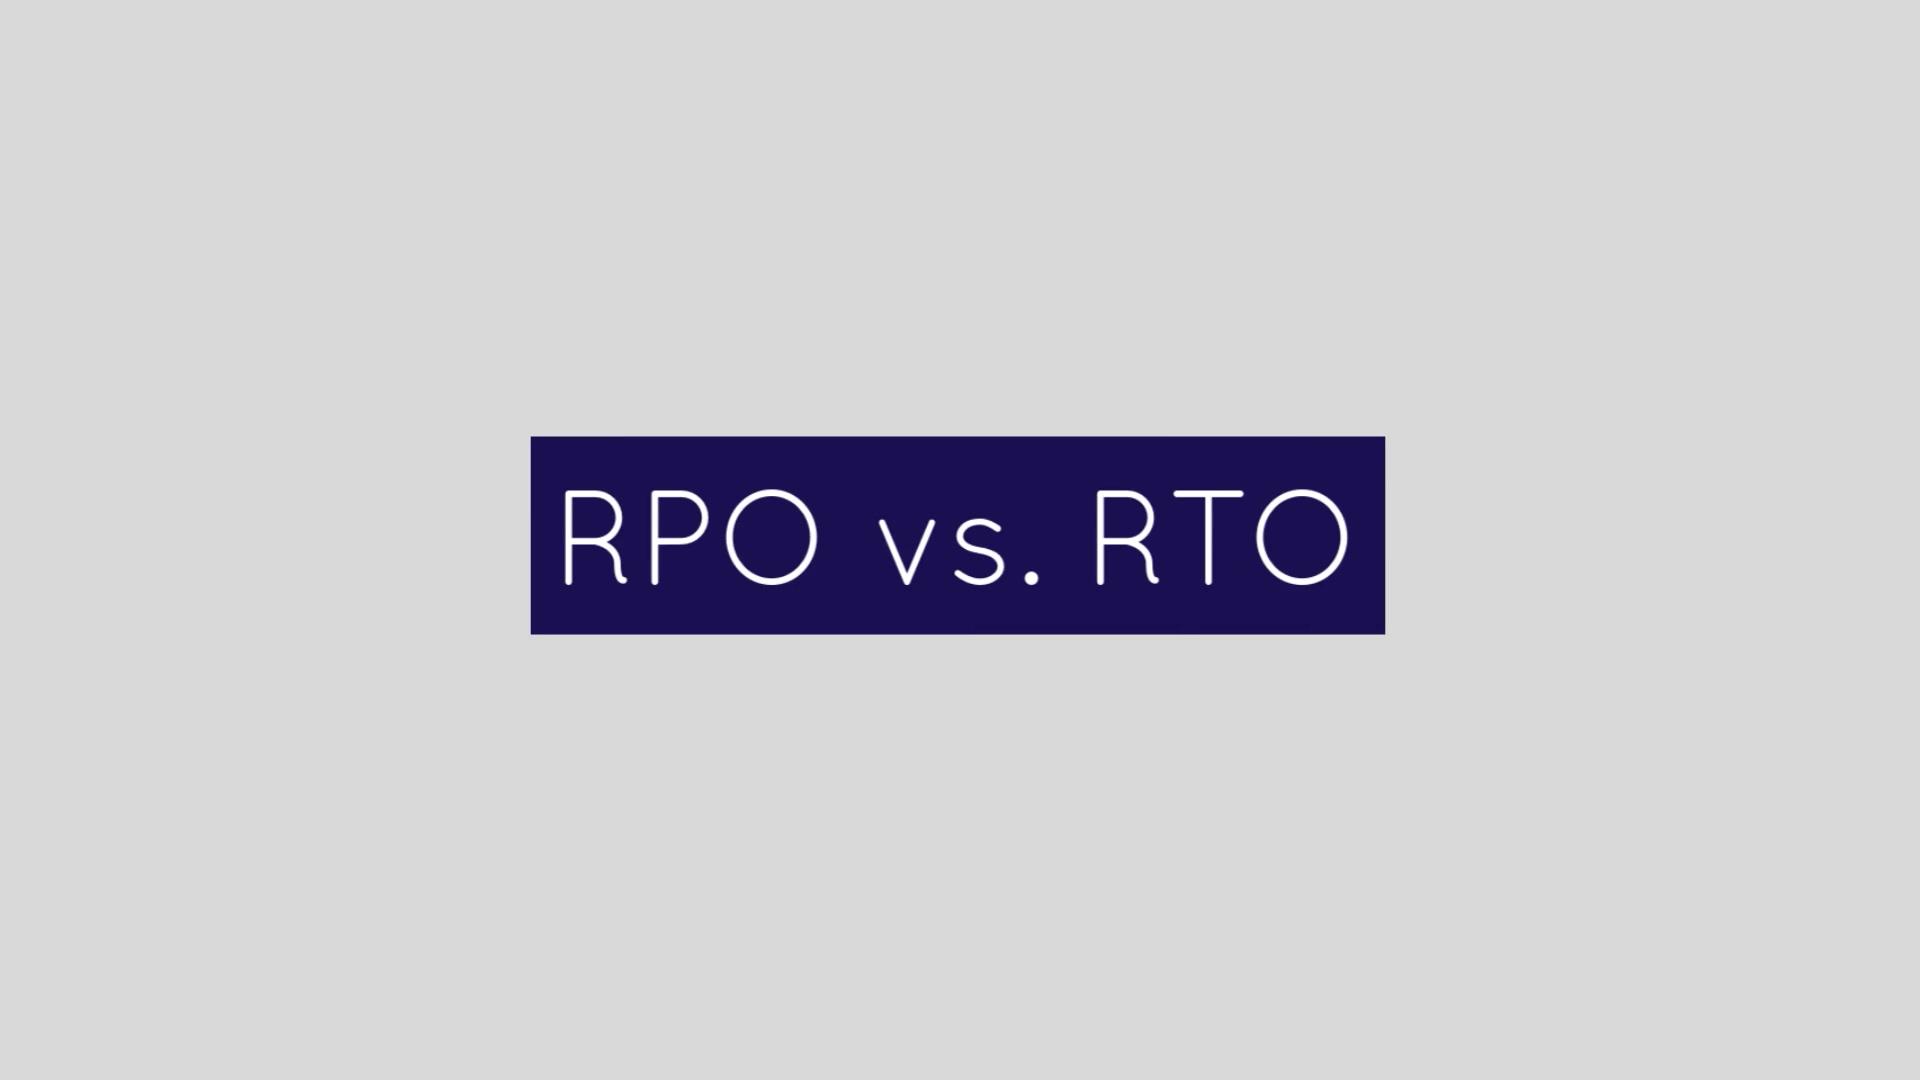 RPO vs RTO (new brand)